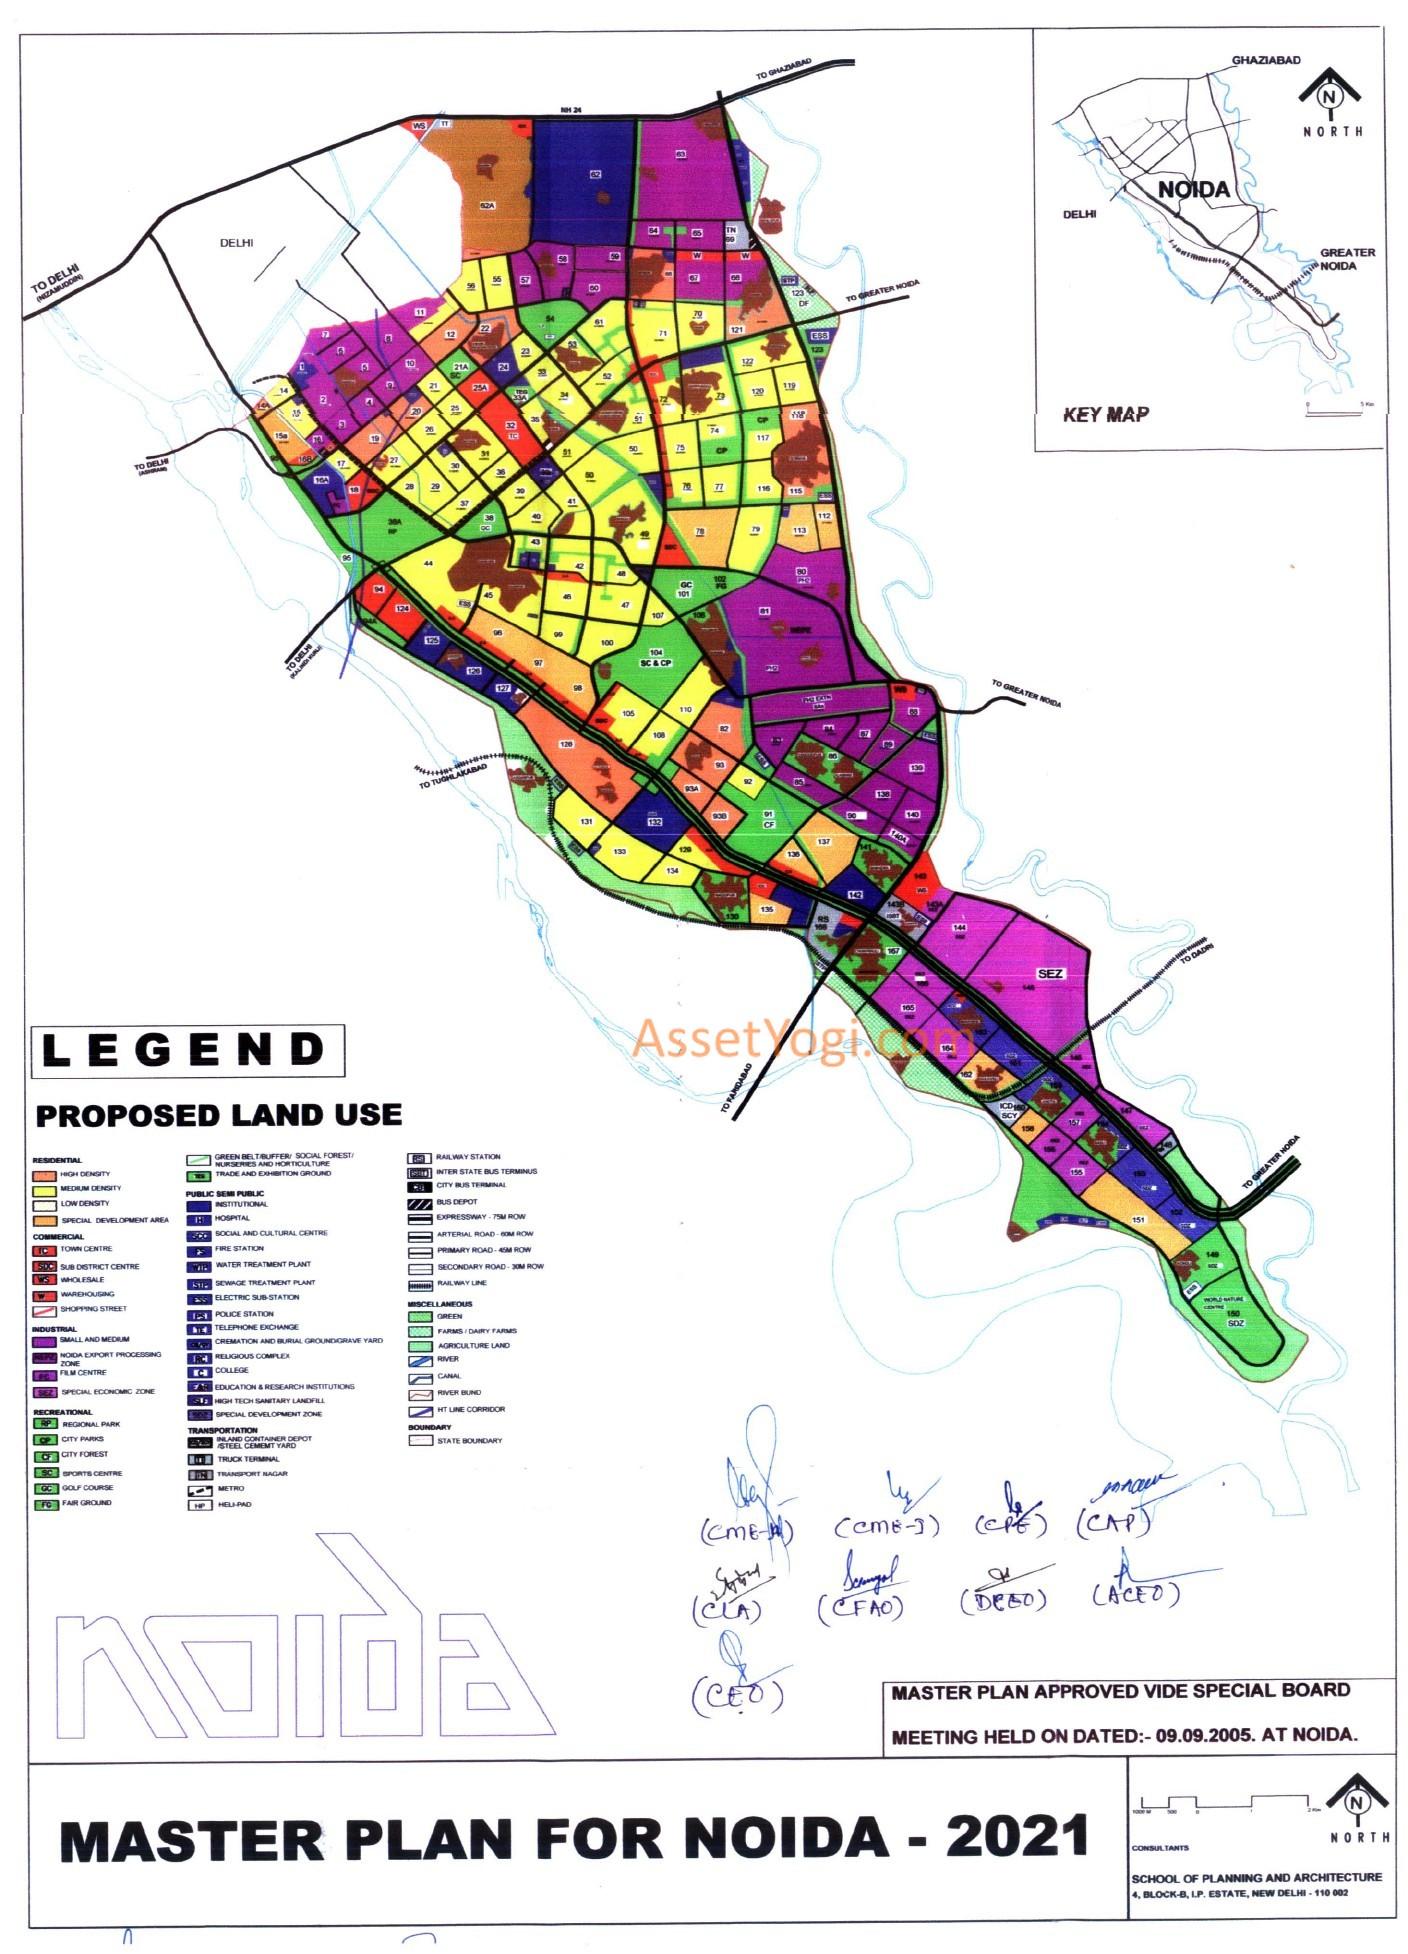 Noida Master Plan 2031, 2021 - Map, Summary & Free Download!